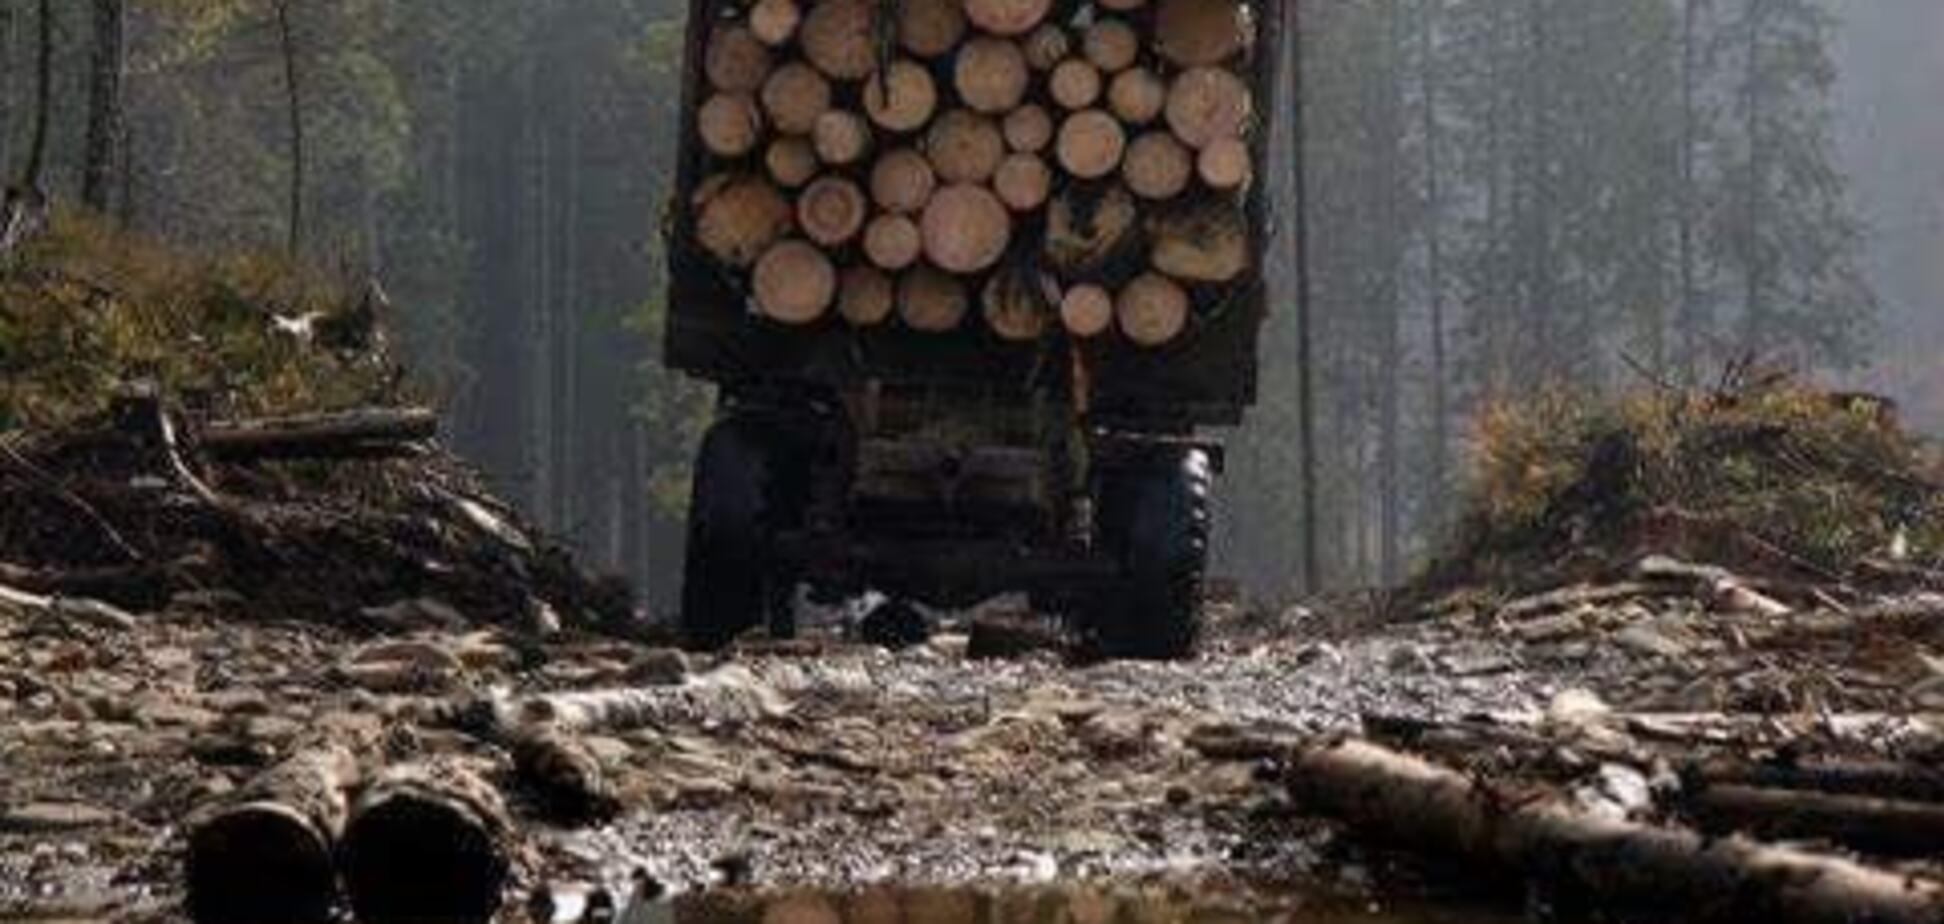 Контрабанда леса из Украины